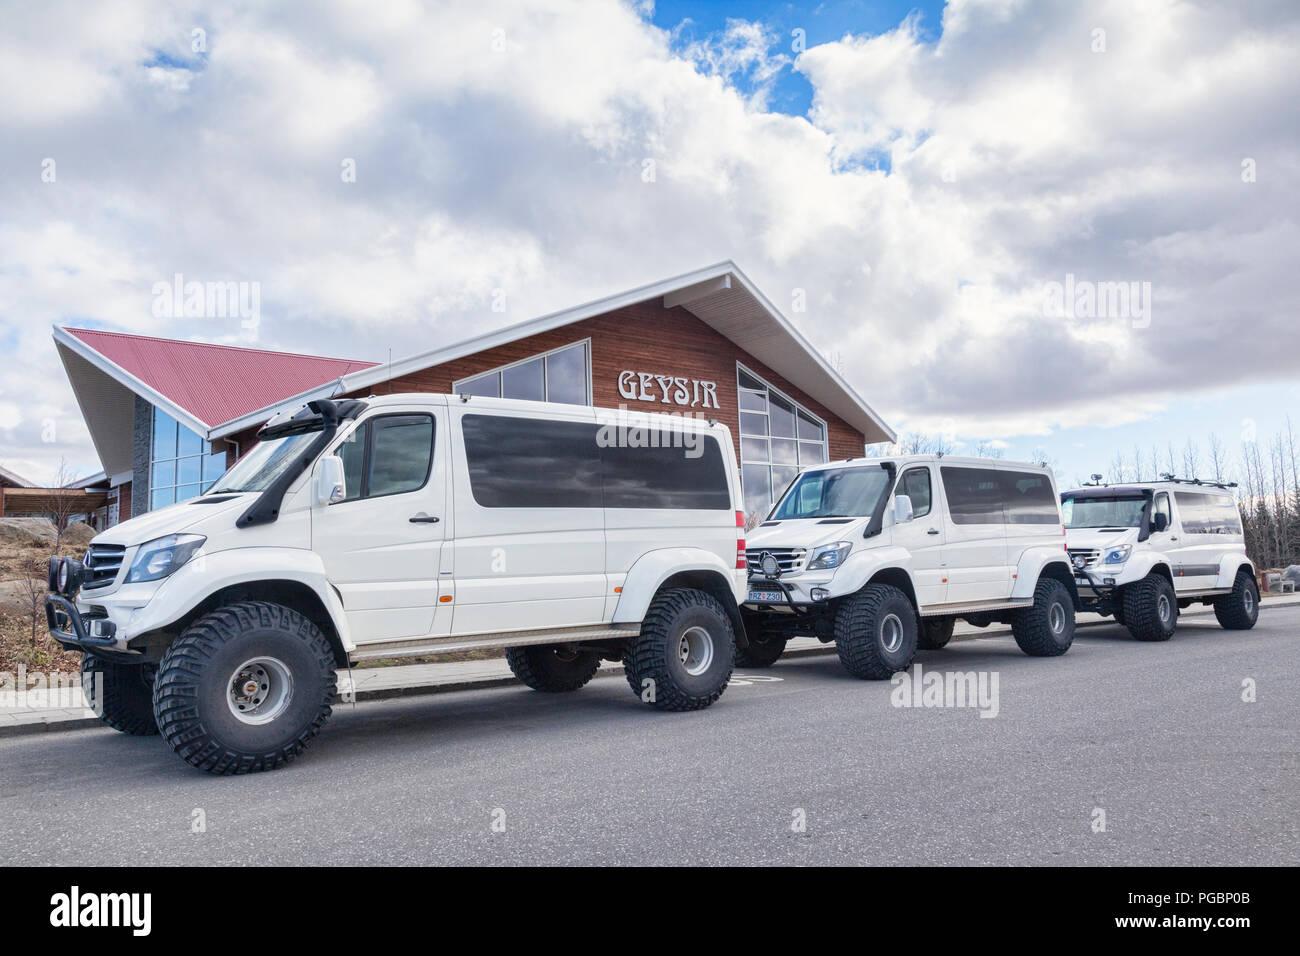 20 avril 2018: Geysir, Islande - trois gros véhicules hors route à Geysir. Photo Stock